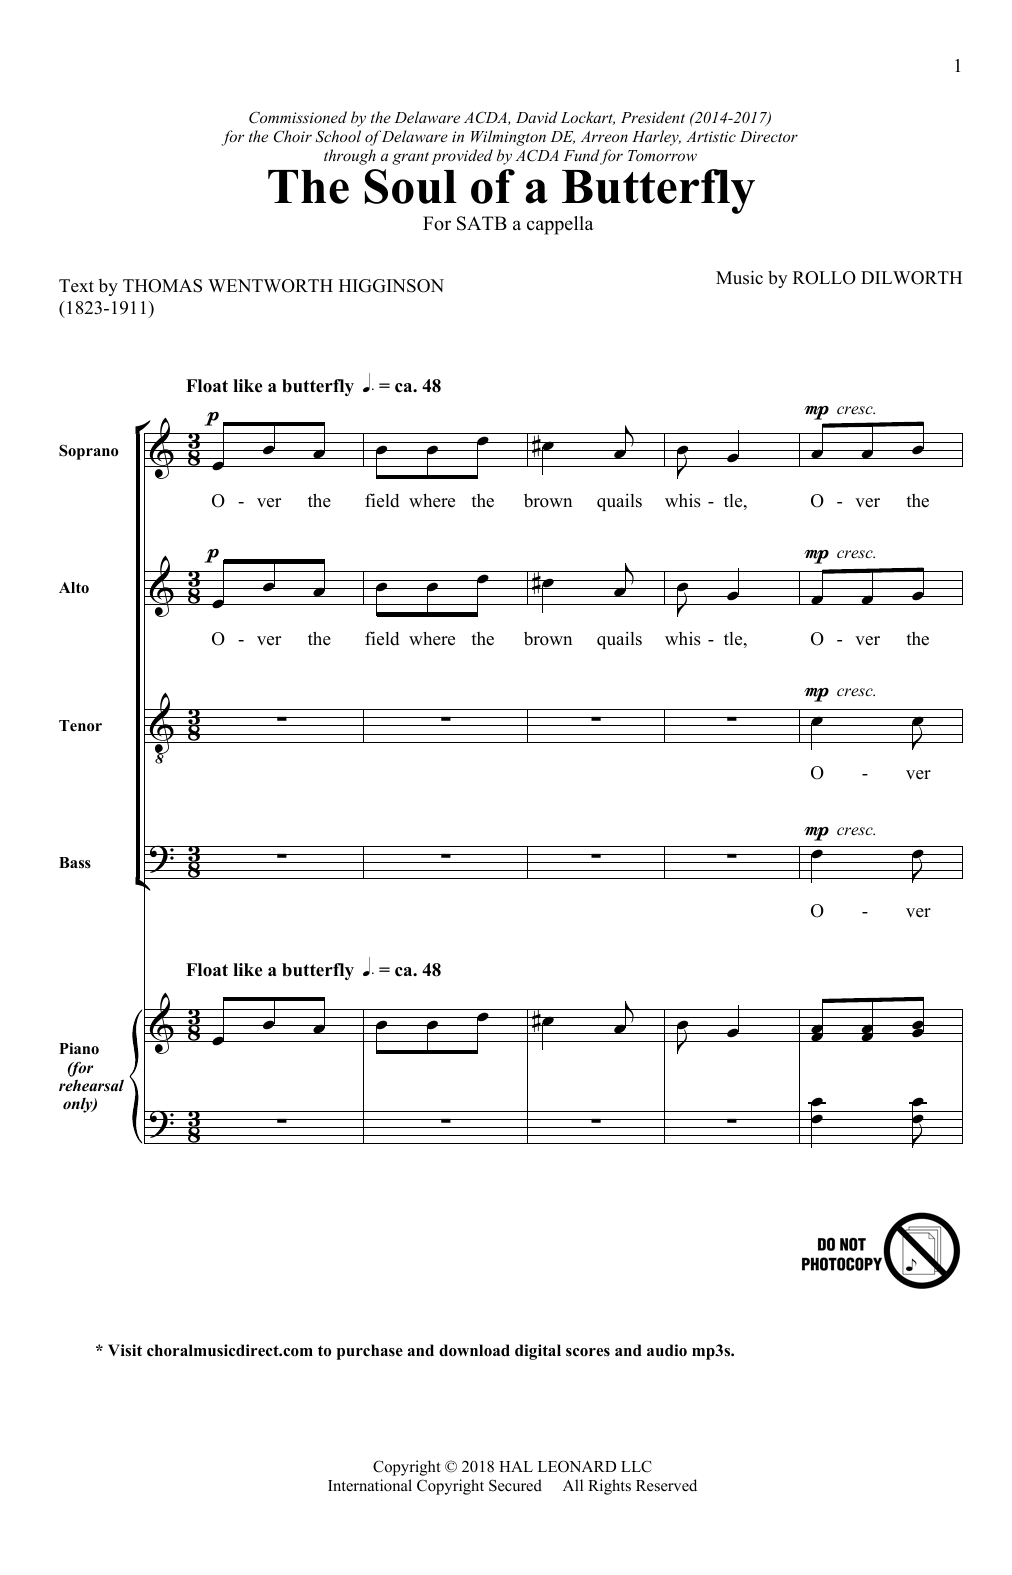 The Soul Of A Butterfly (SATB Choir)